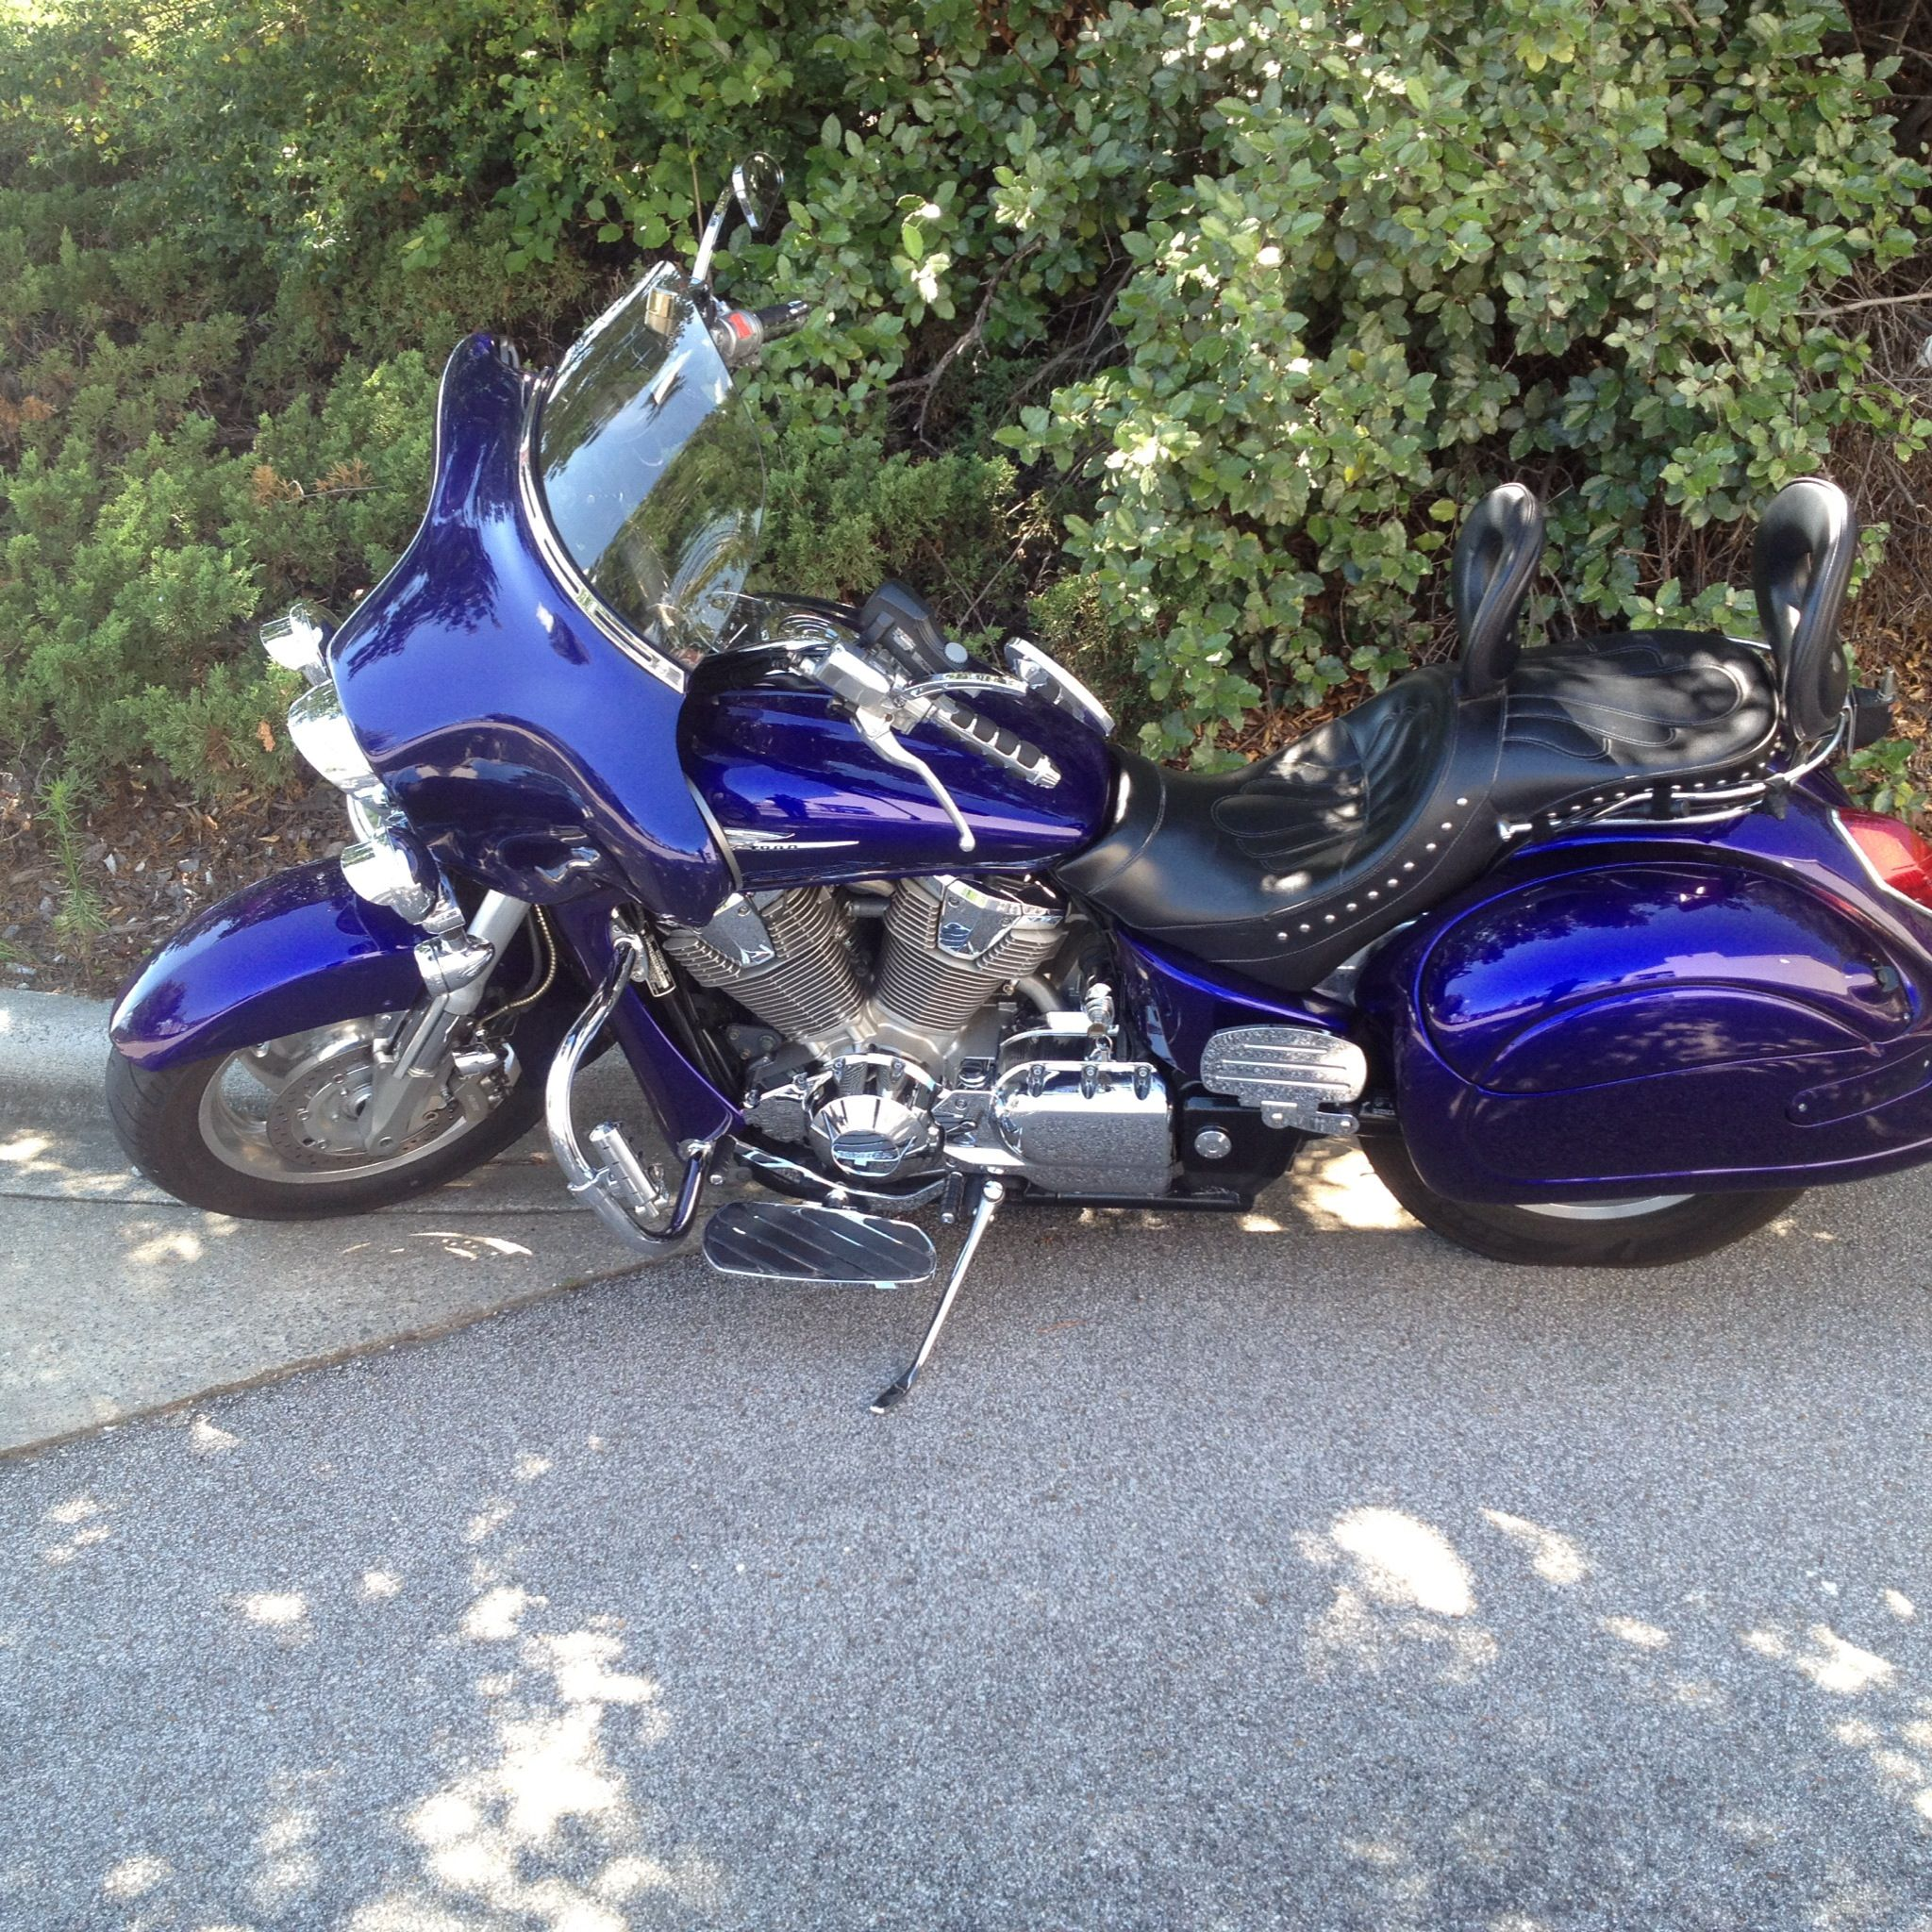 2003 honda vtx 1800 retro illusion blue corbin dual tourer seat beetlebags wide open customs fairing [ 2048 x 2048 Pixel ]